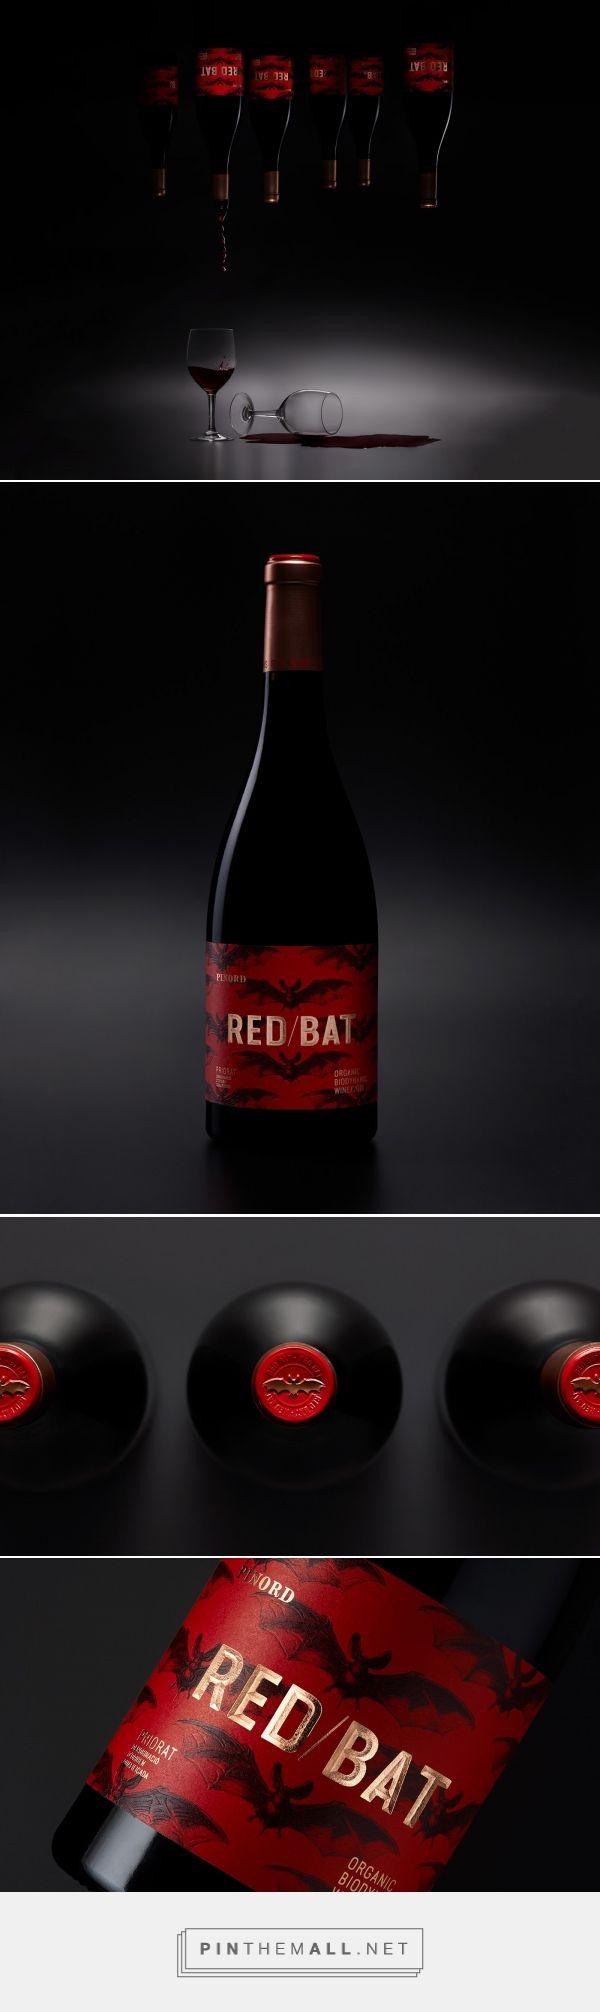 Red Bat Wine Packaging Design Bottle Packaging Packaging Design